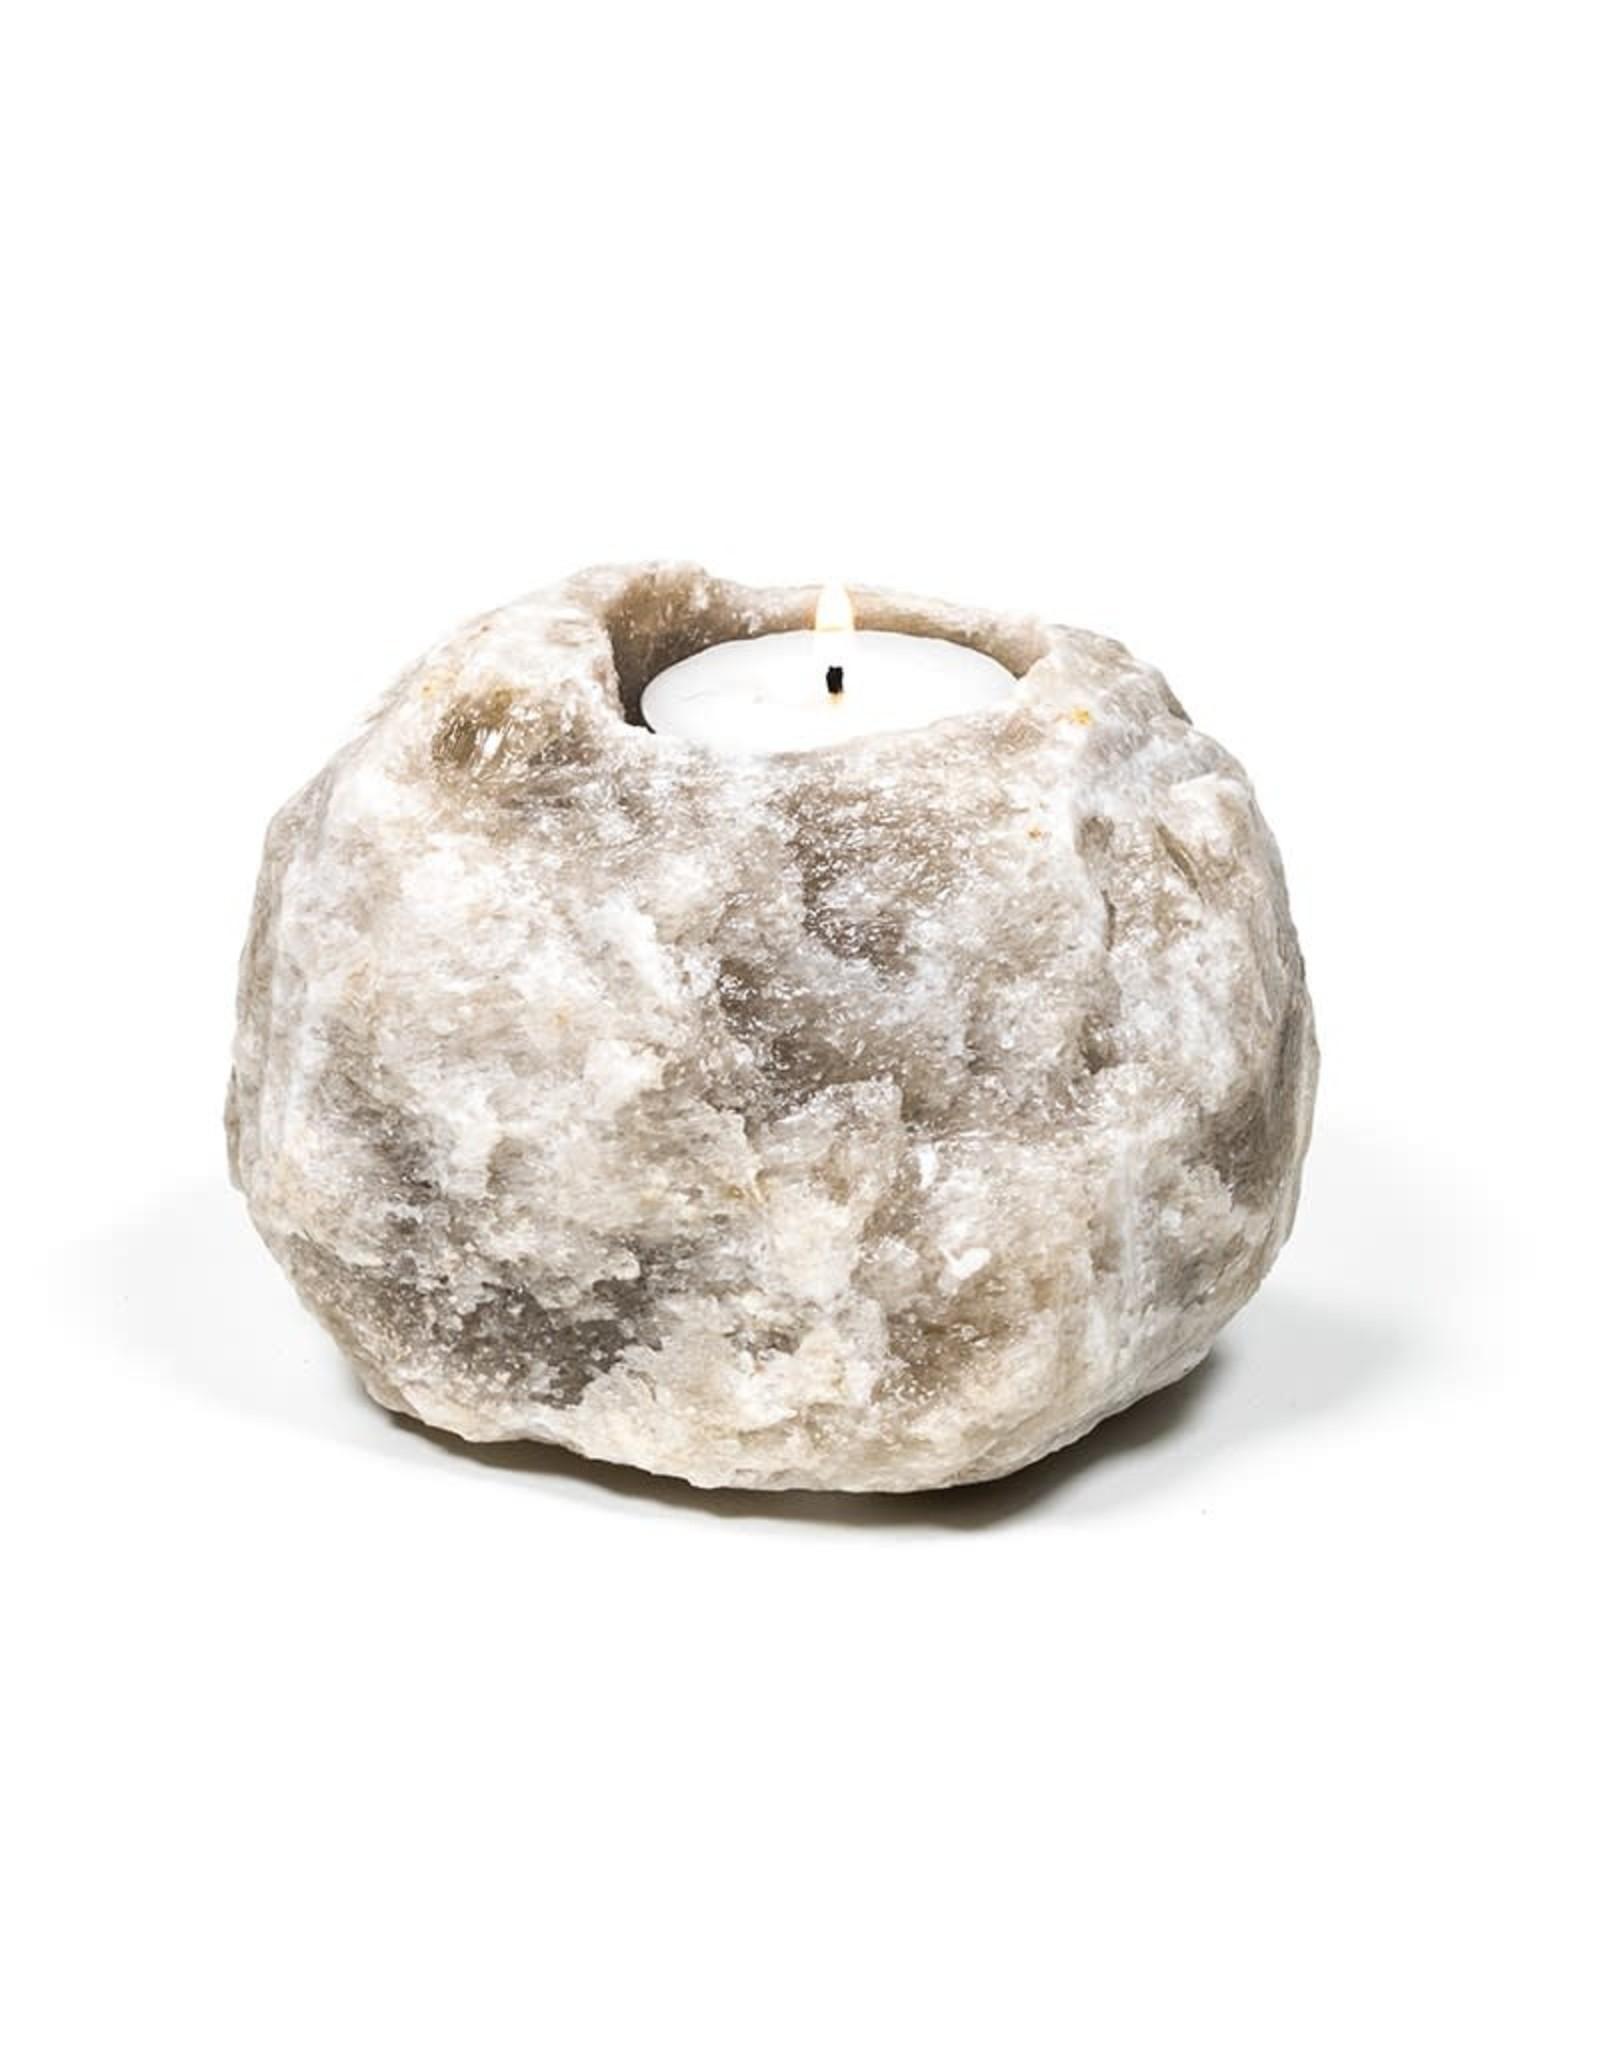 Waxinehouder Himalaya Zoutkristal Grijs